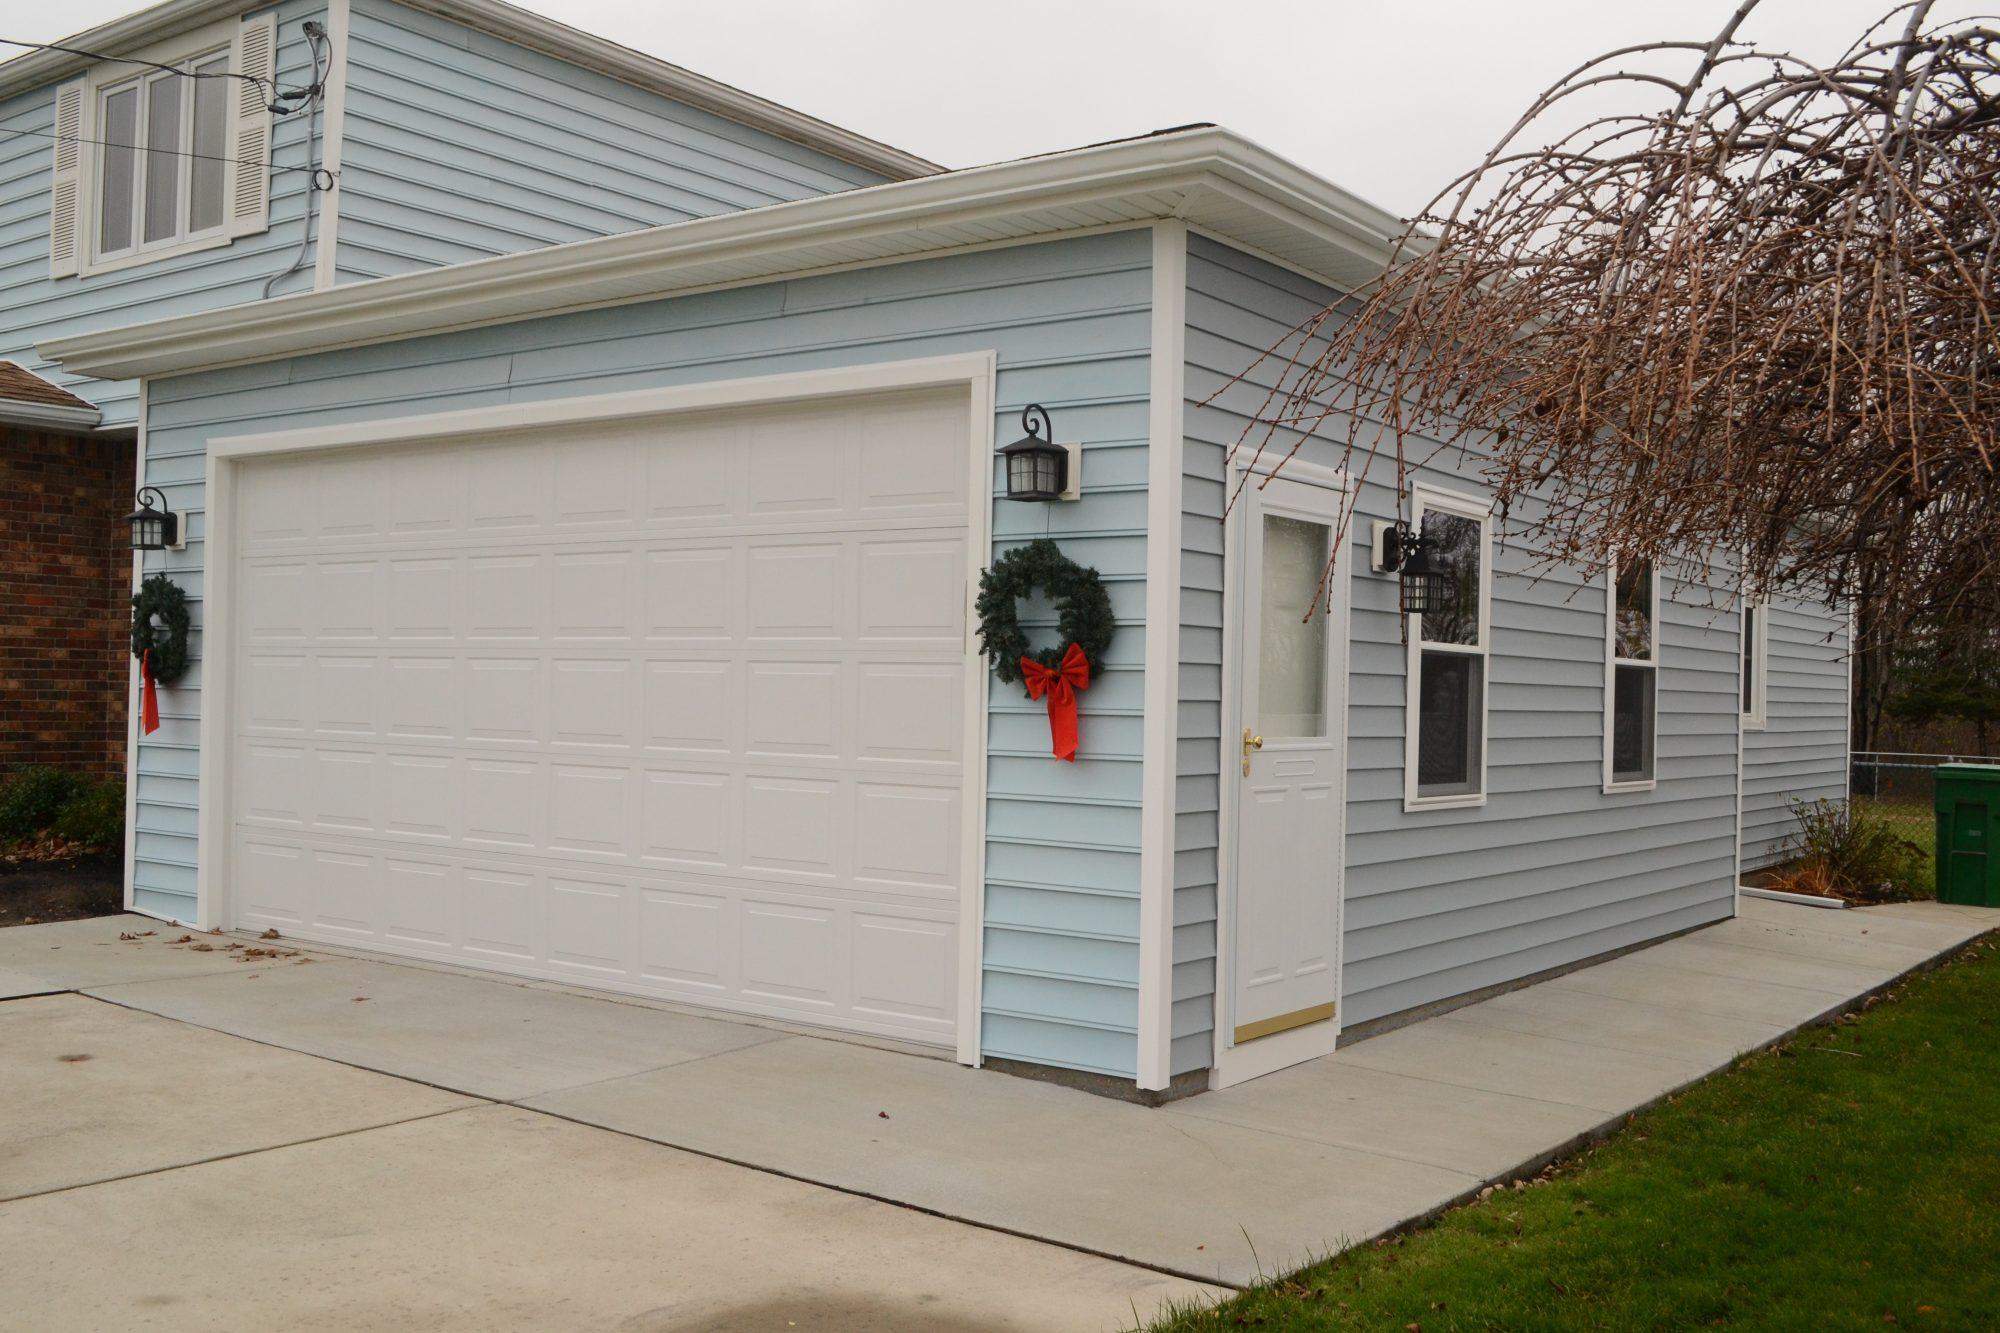 amarr on mo of doors good barn kansas tan garage city raynor ideas by door pin great